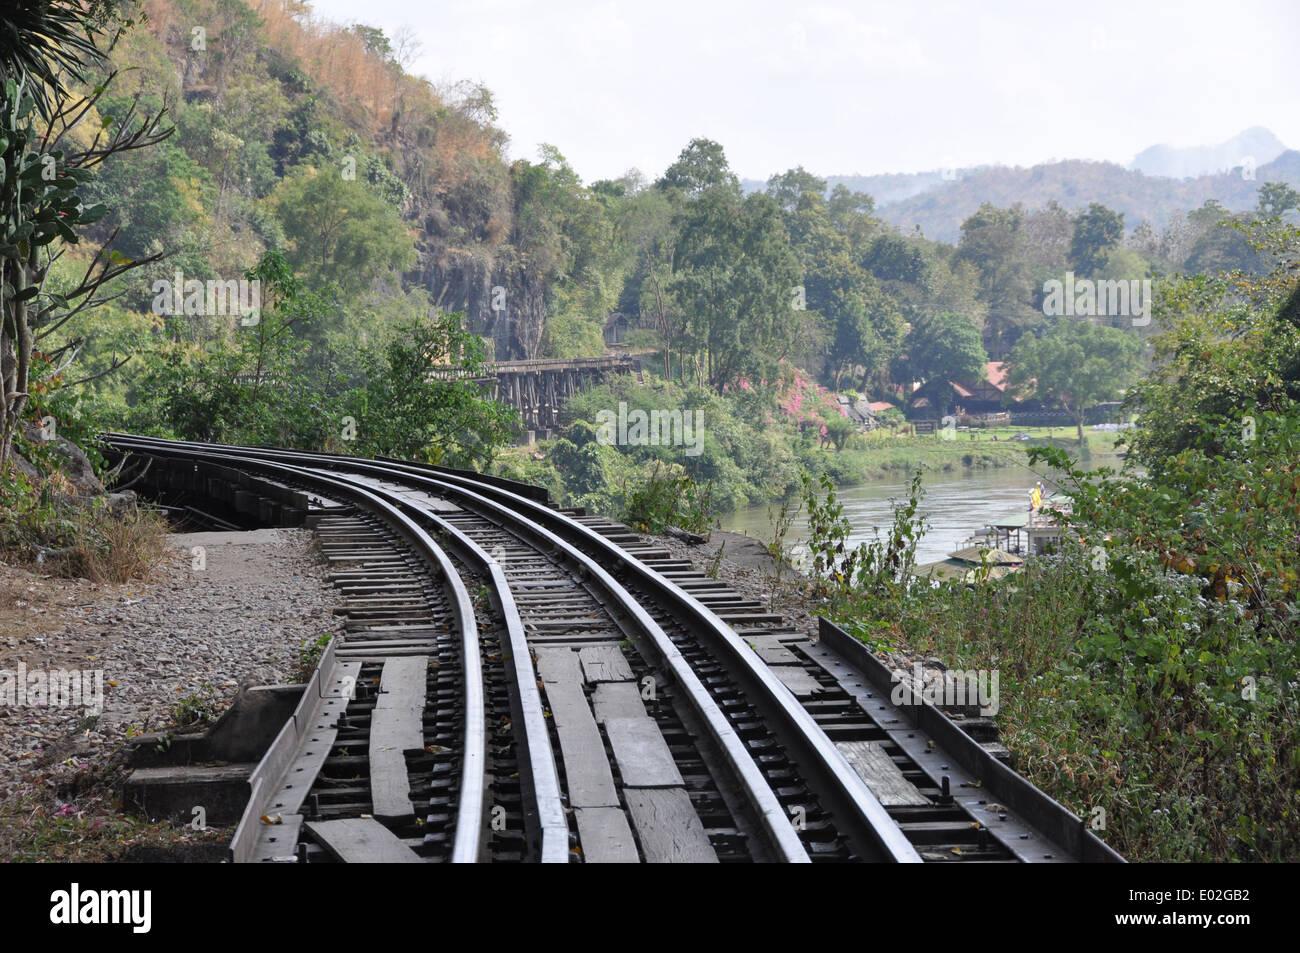 Thai Burma railway. - Stock Image